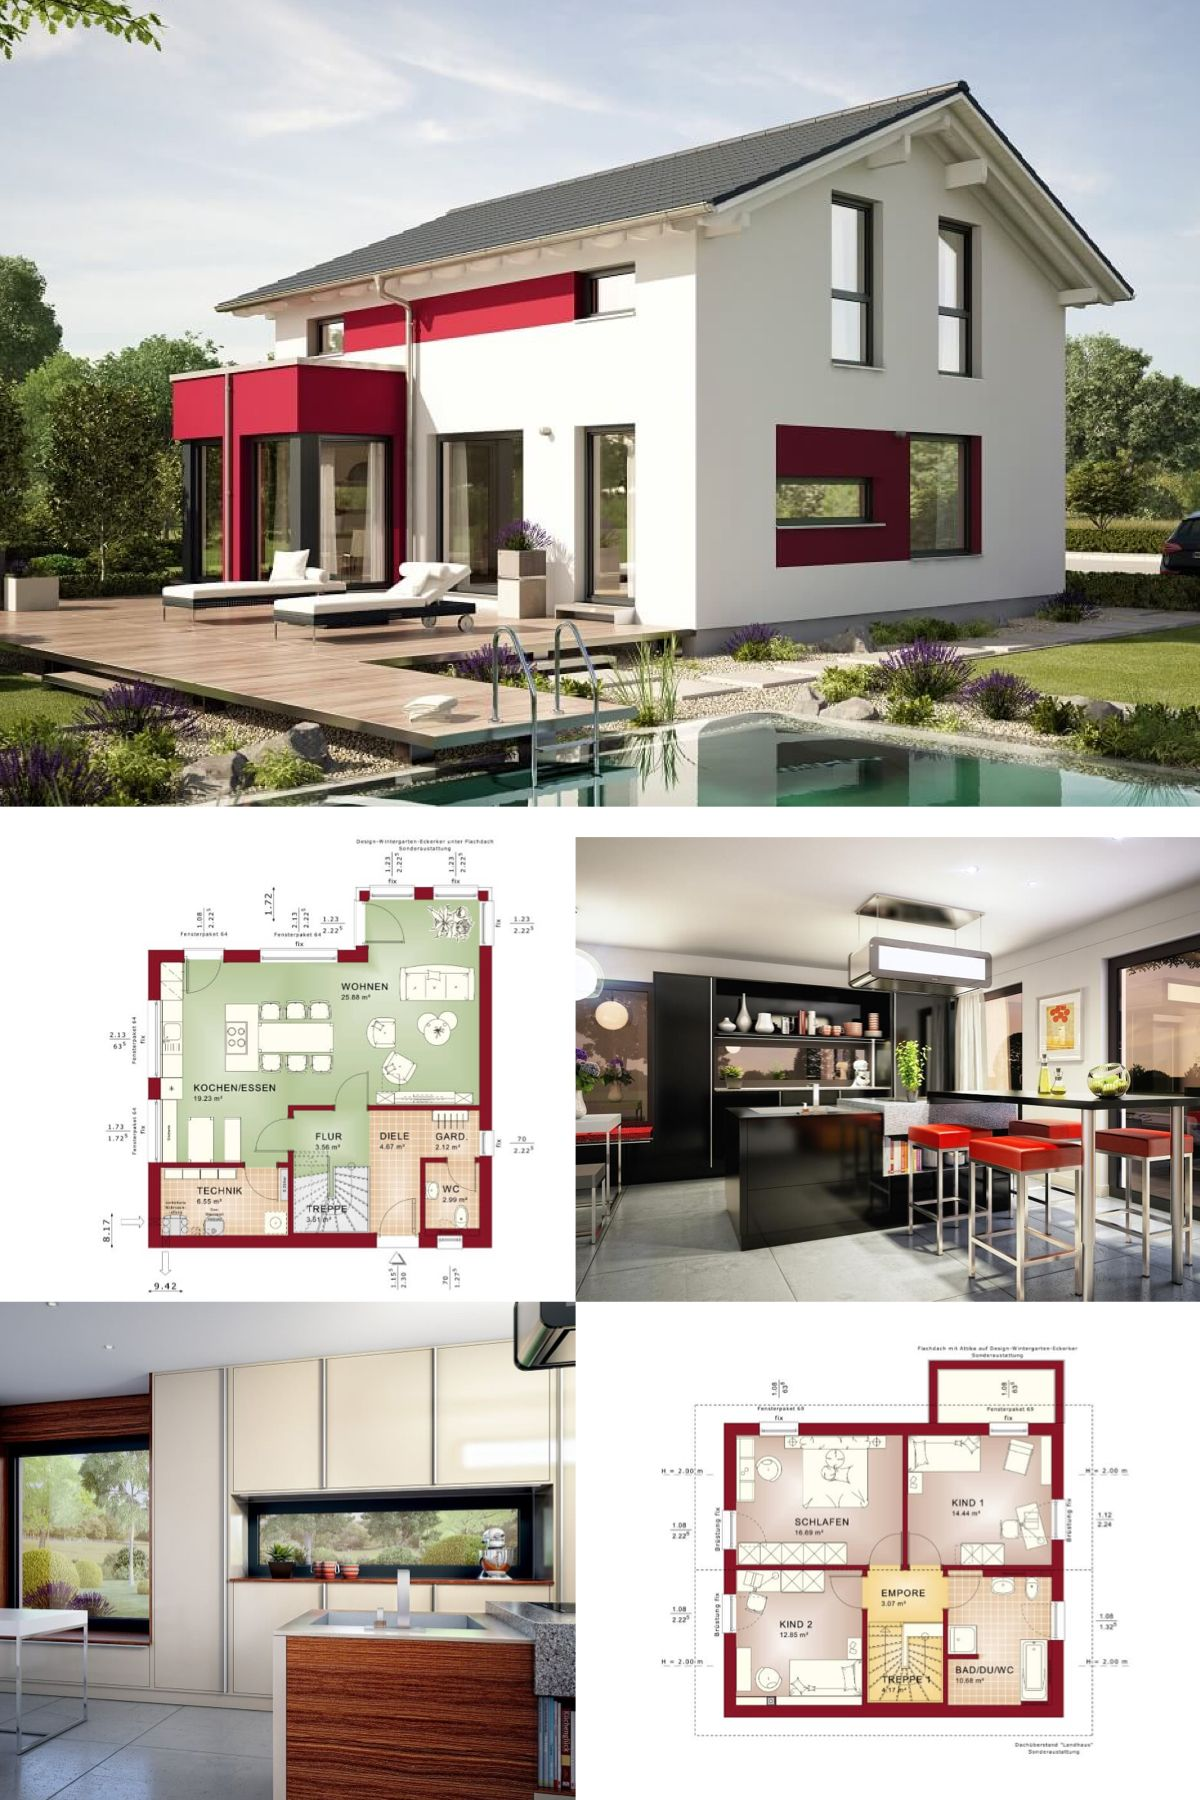 einfamilienhaus modern grundriss haus edition 1 v4 bien zenker fertighaus satteldach fassadengestaltung putz - Fertighausplne